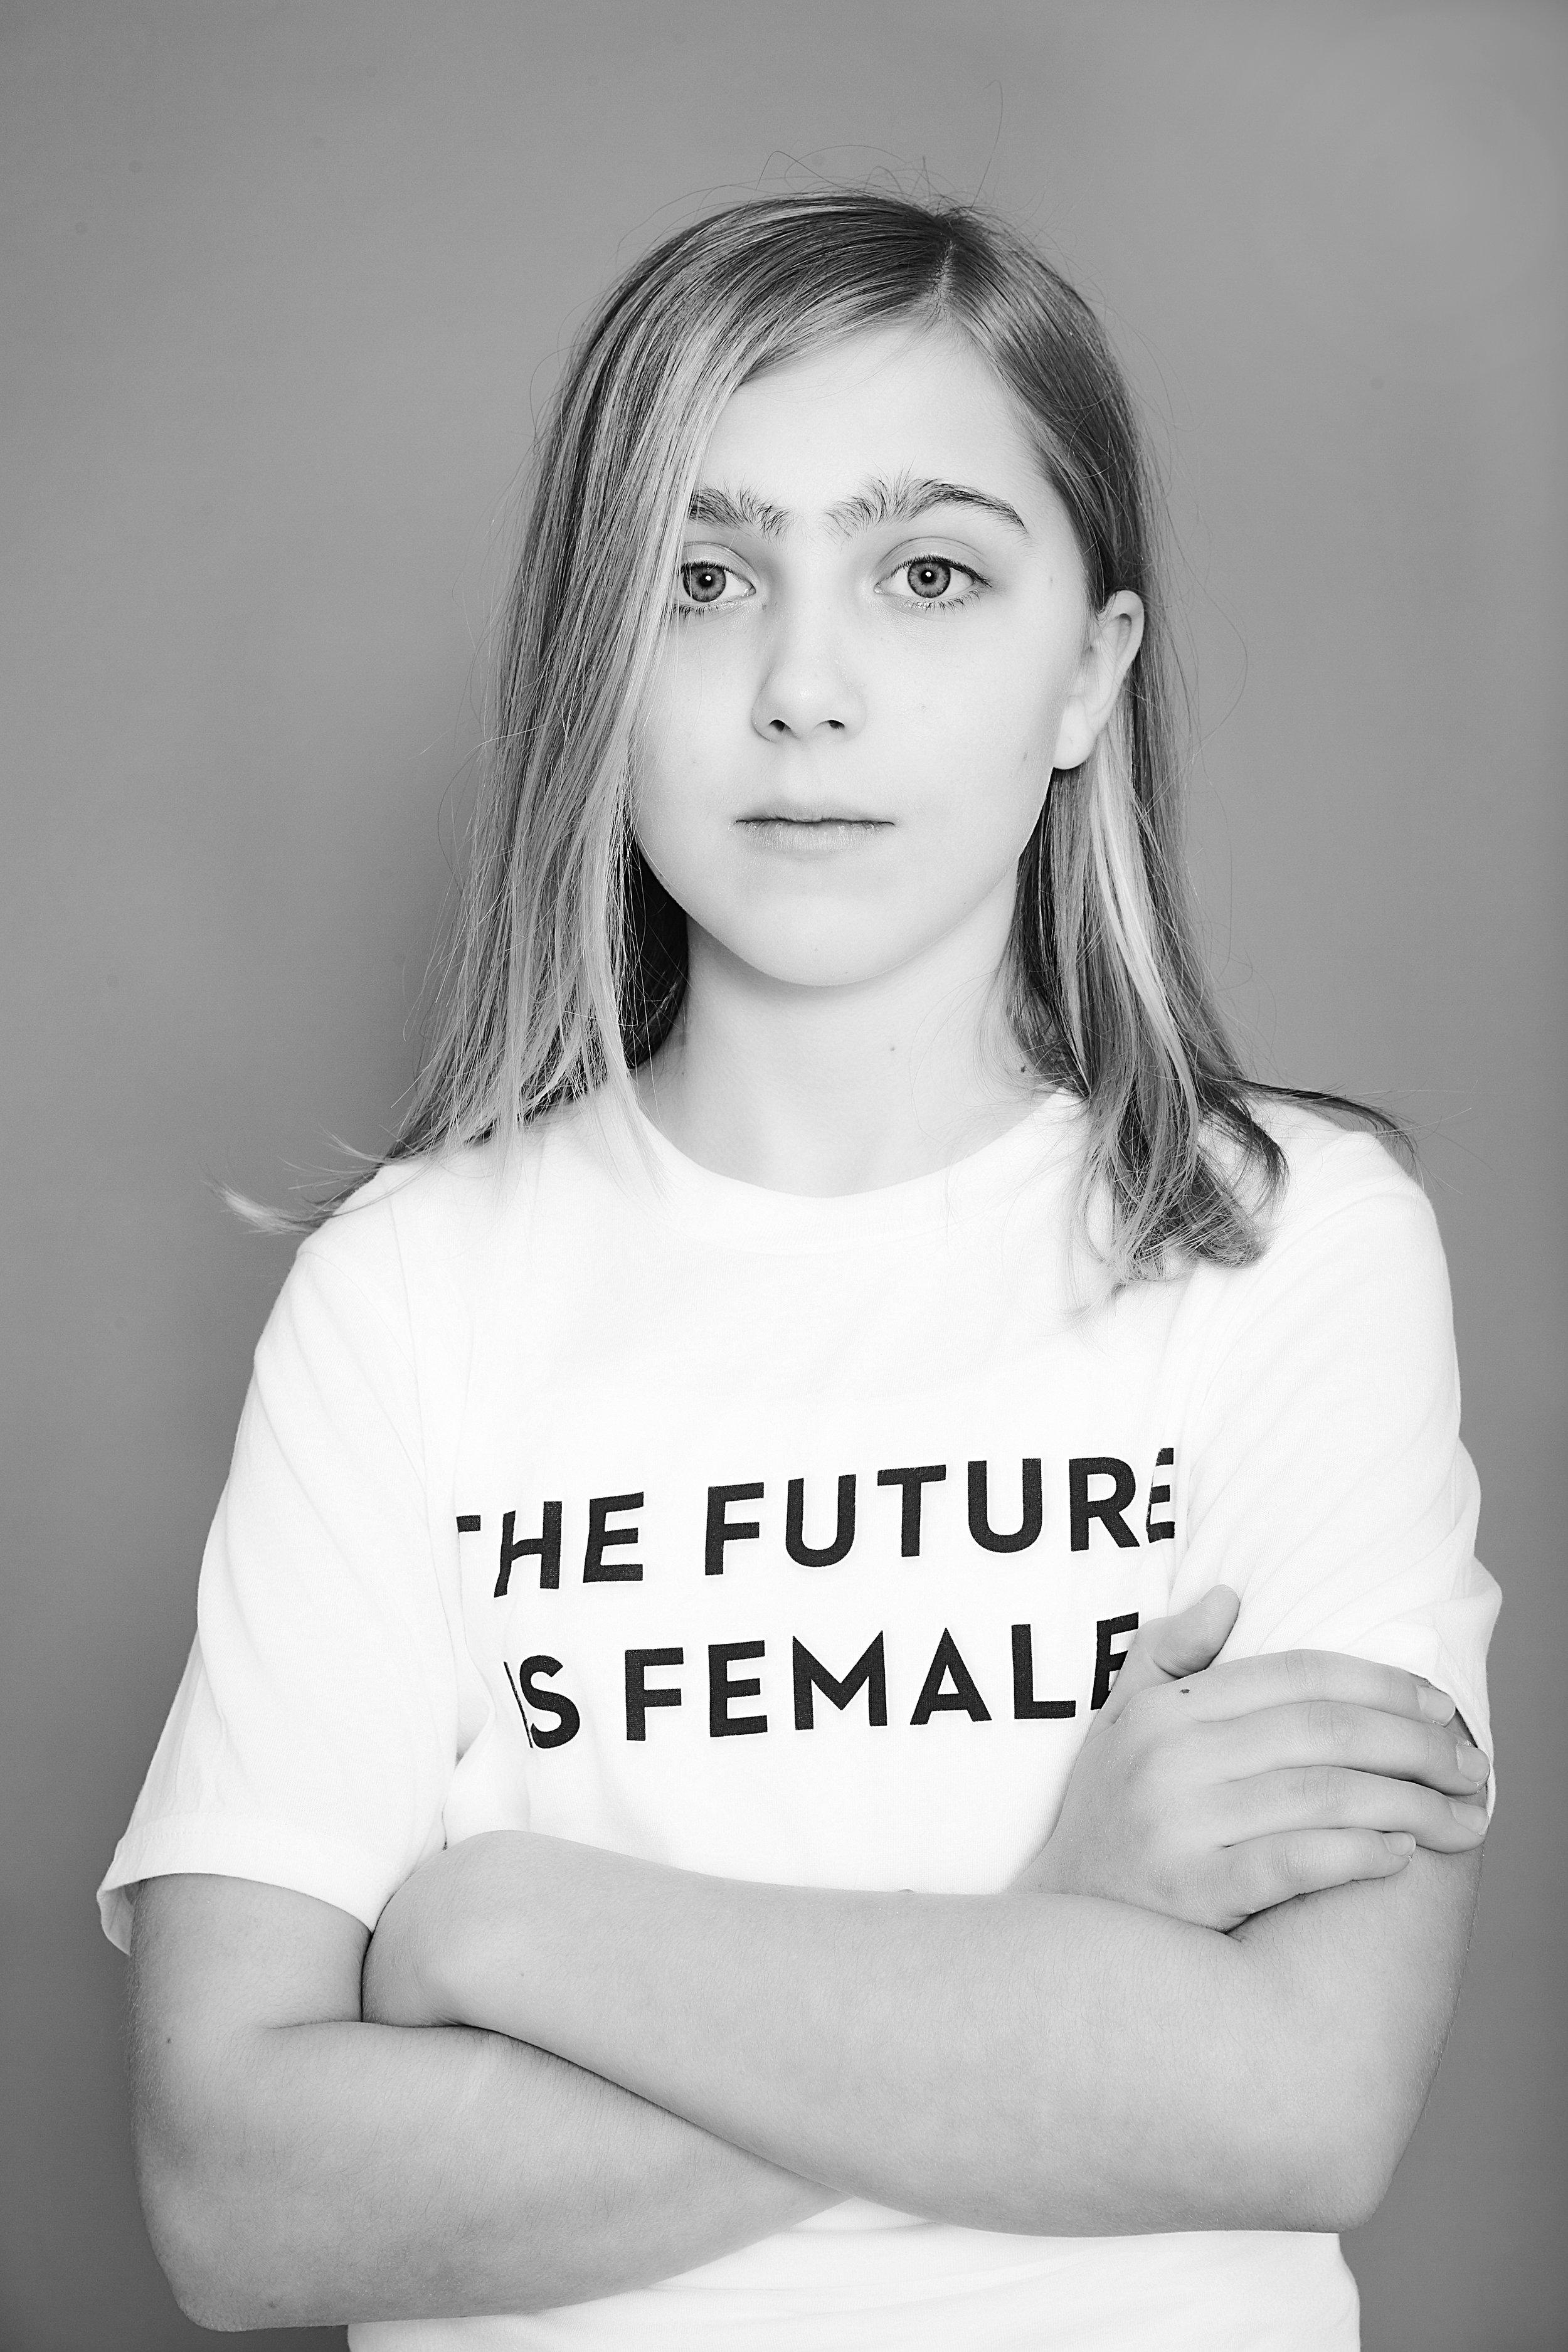 2017_the_future_is_female_001_bw_r.jpg